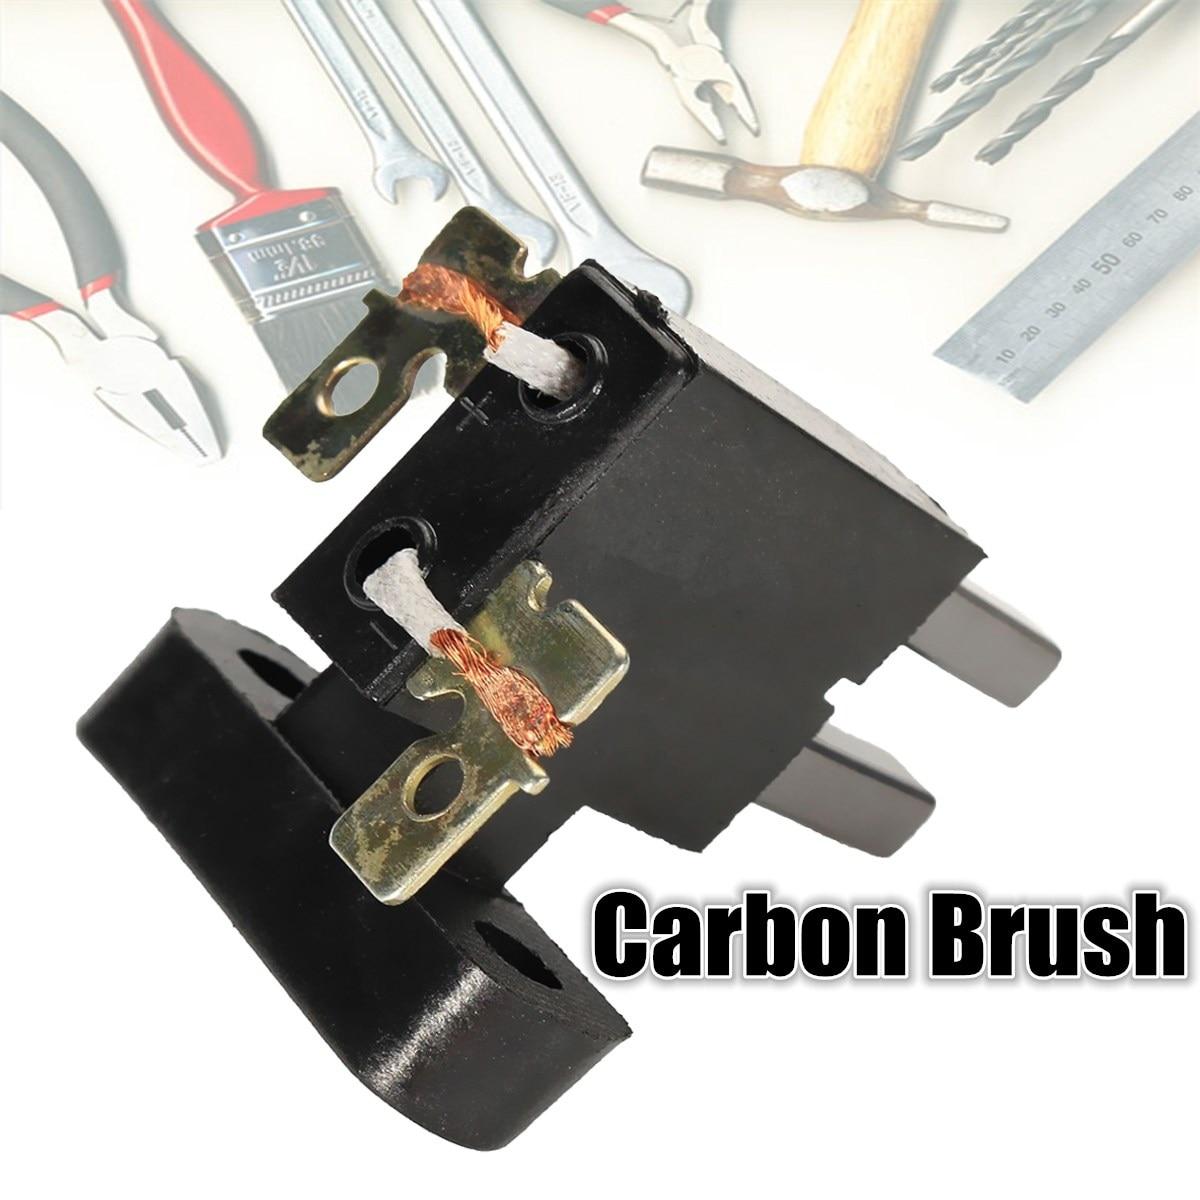 1Pcs Universal Carbon Brush For Honda Powermate For Kawasaki 4KW 5KW 7KW Generator AVR generator brushes generator carbon brushcarbon brush for generator - AliExpress